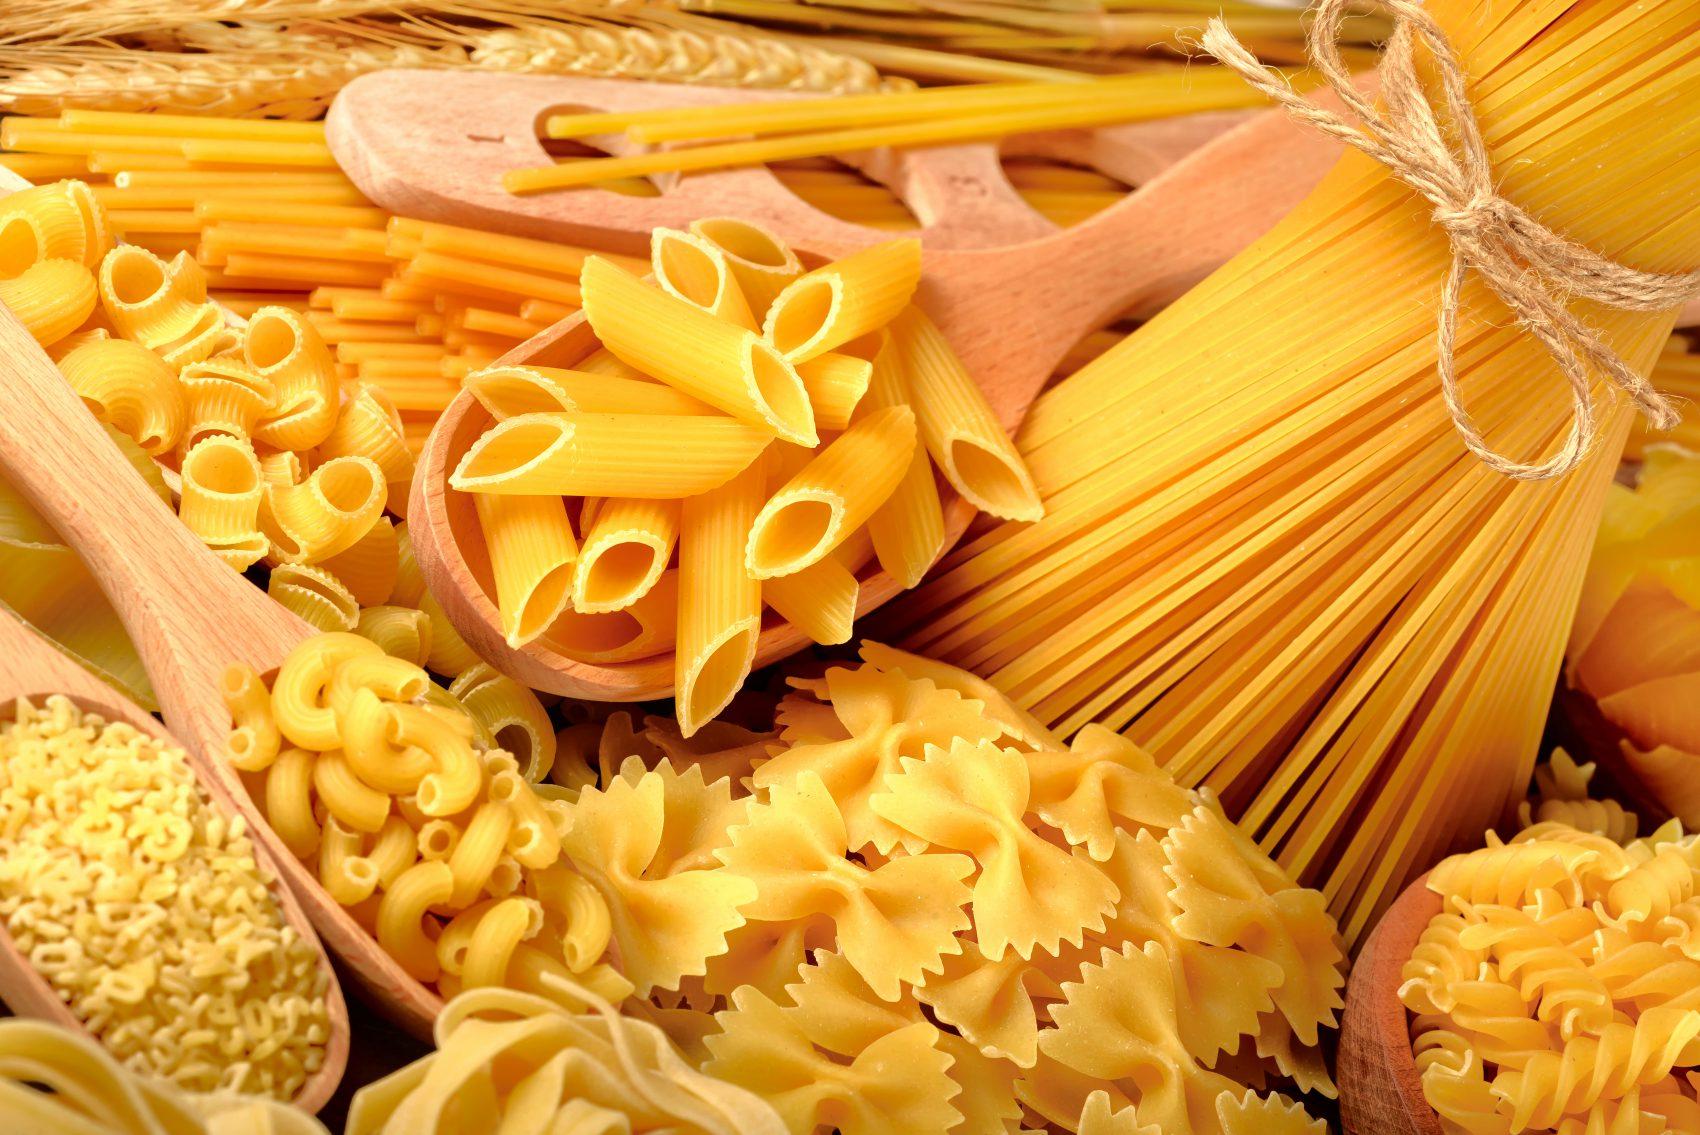 Italian Super Market